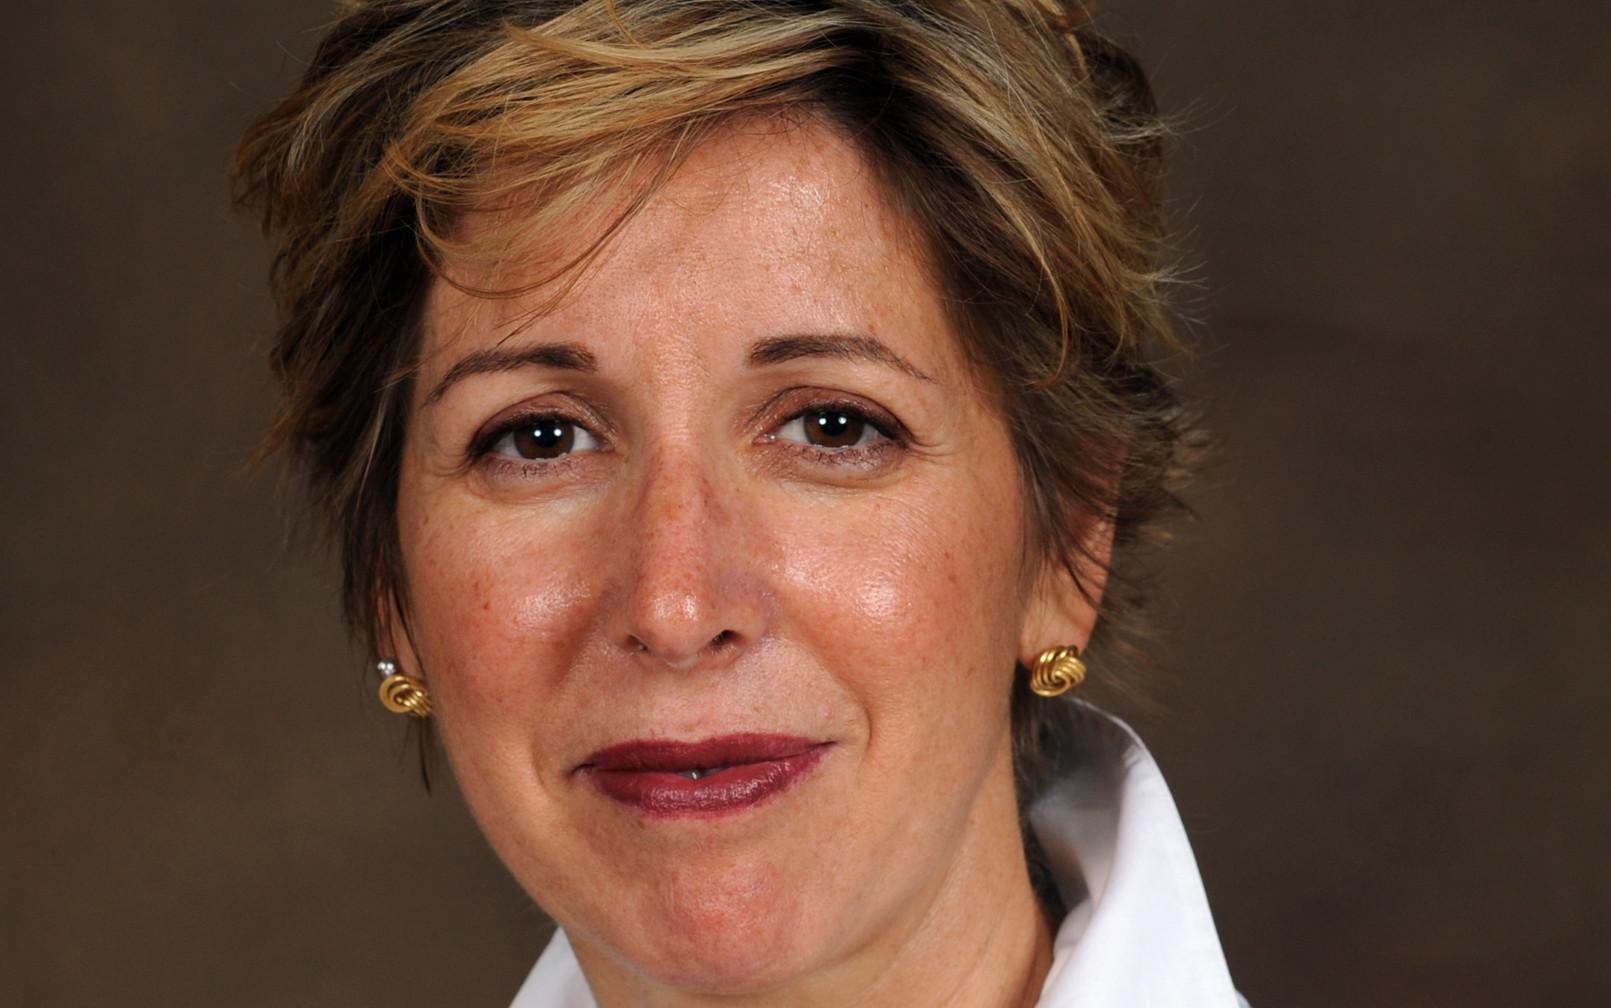 Danielle Pletka | World Economic Forum